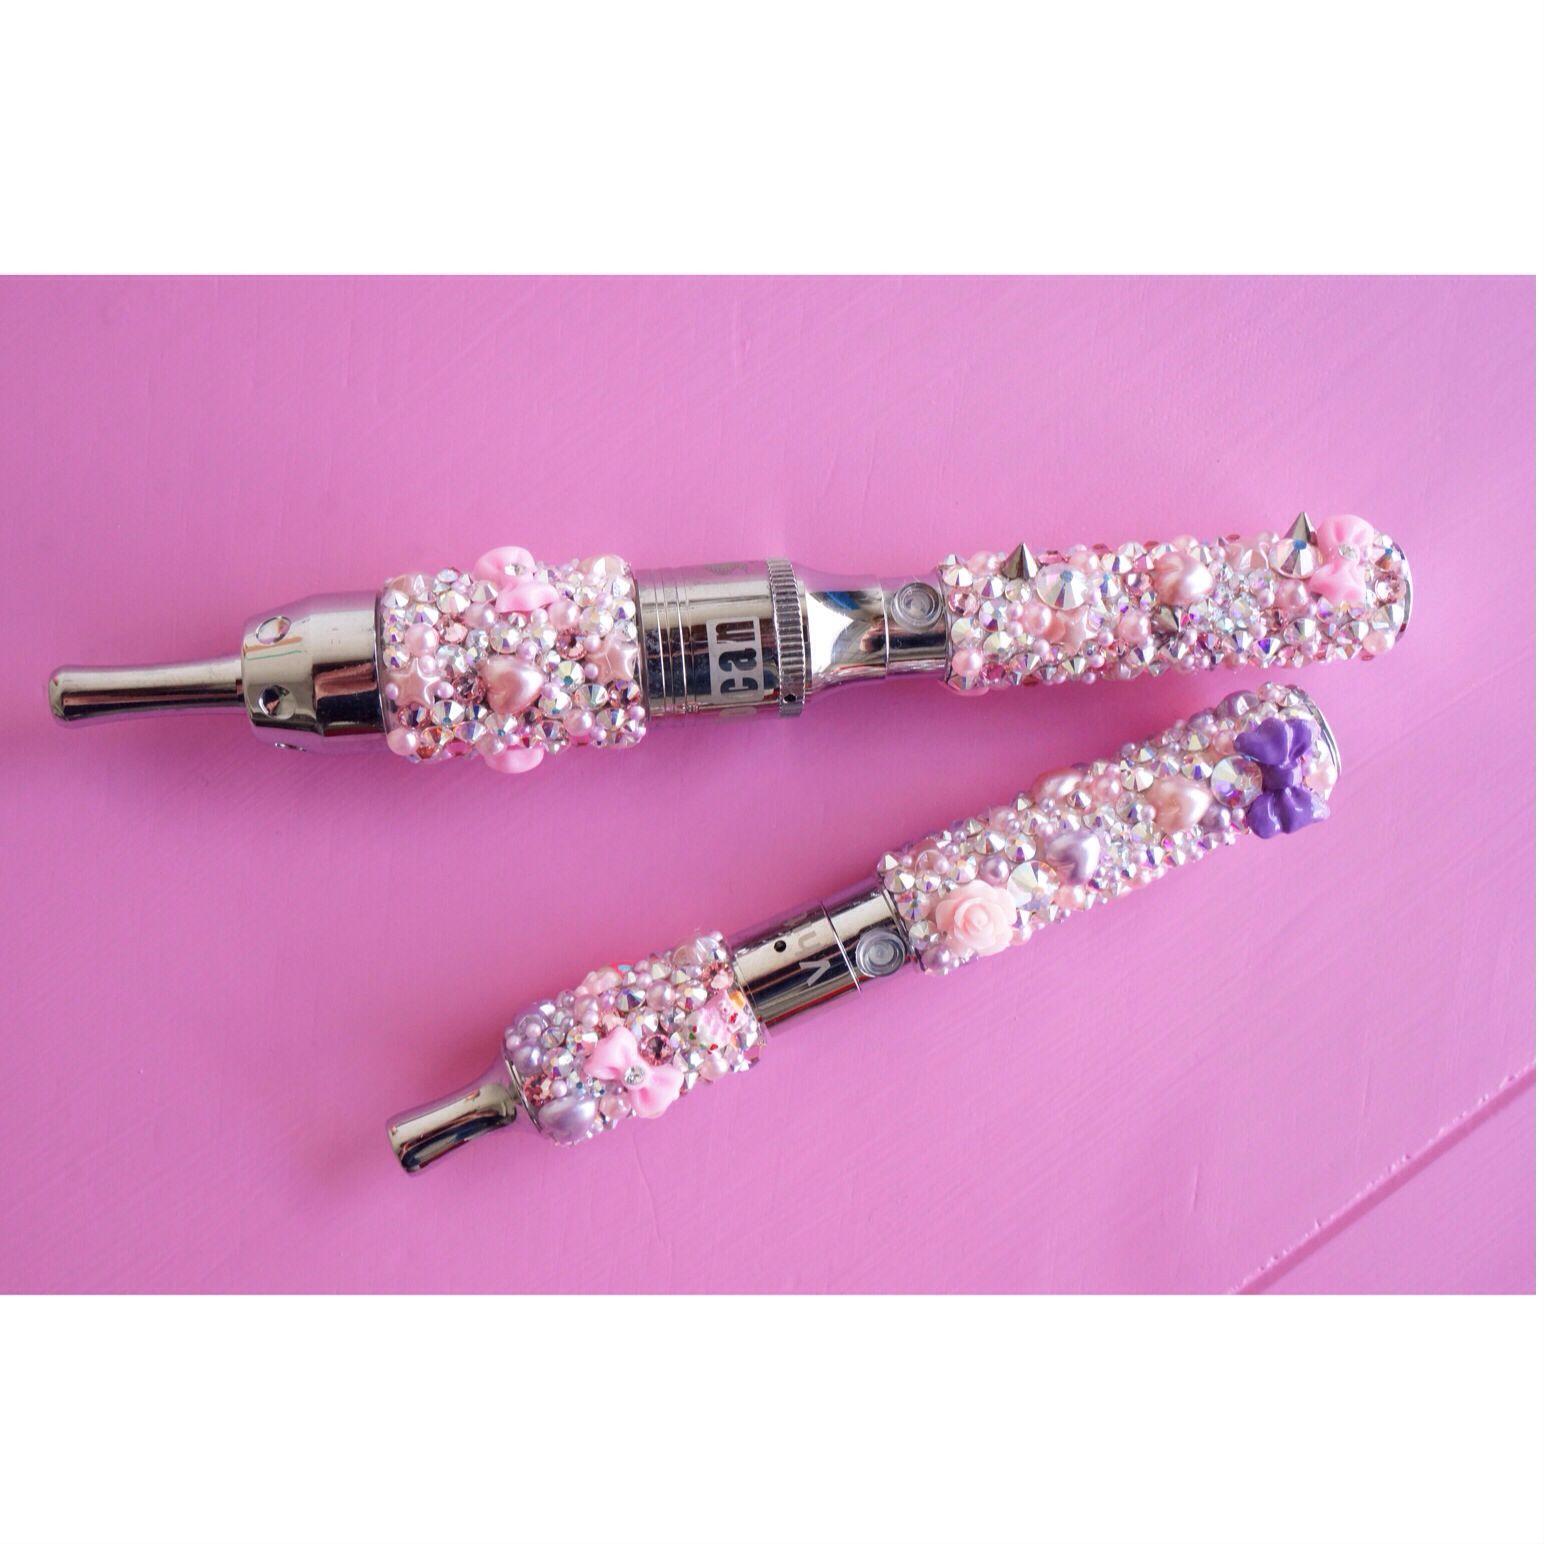 Swarovski Crystal Bling Vape Pen The Crystal Cult The Crystalcult